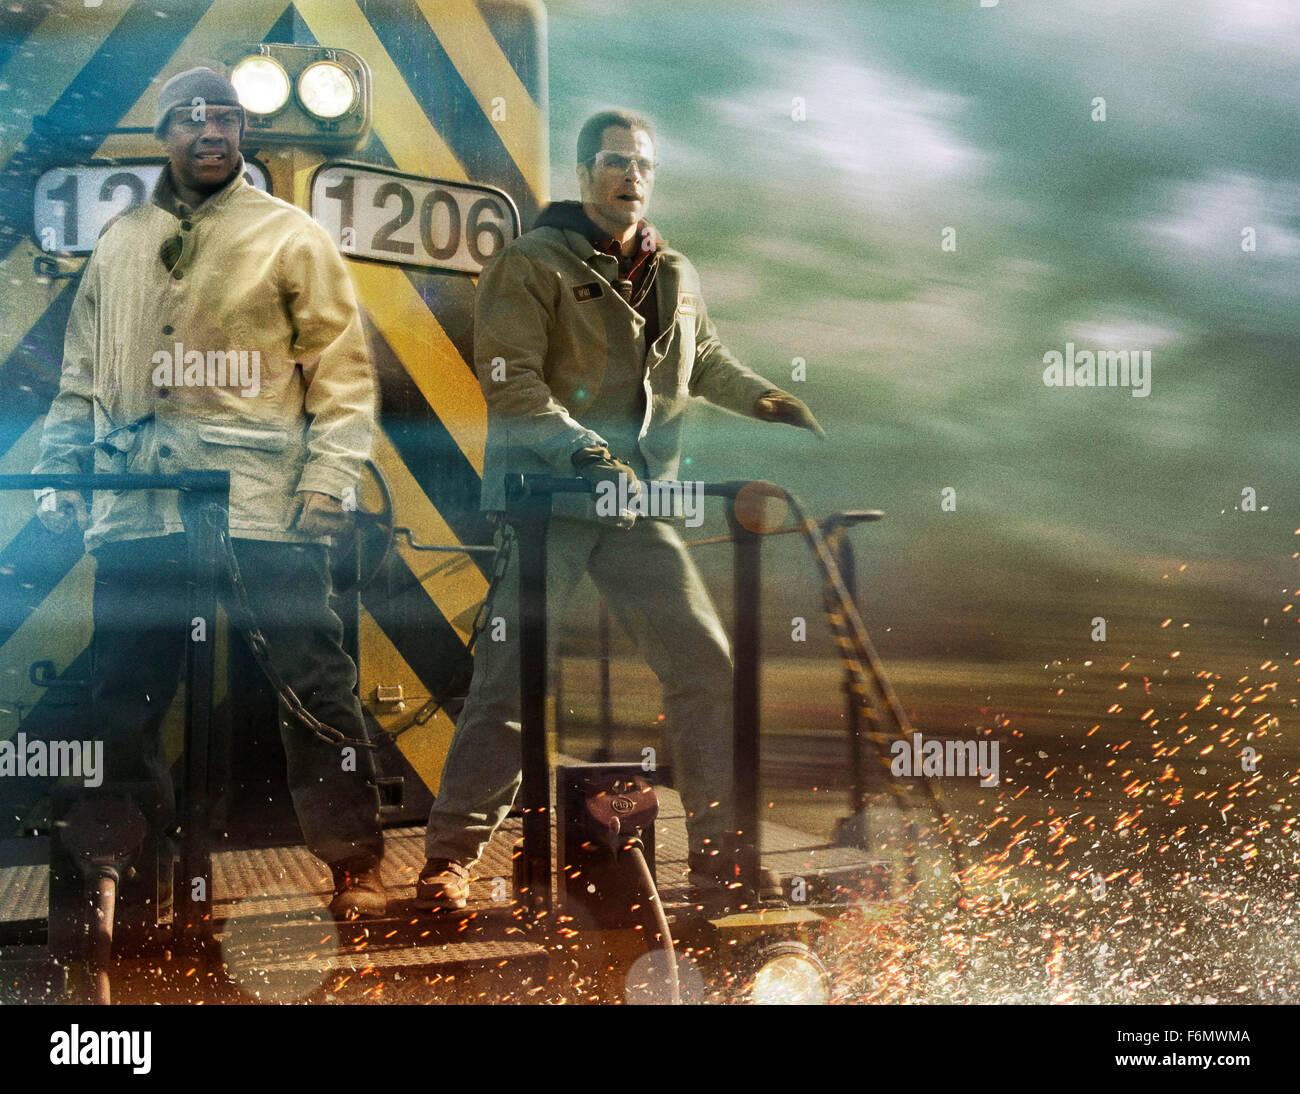 RELEASE DATE: November 12, 2010. MOVIE TITLE: Unstoppable. STUDIO: 20th Century Fox. PLOT: A rail company frantically - Stock Image